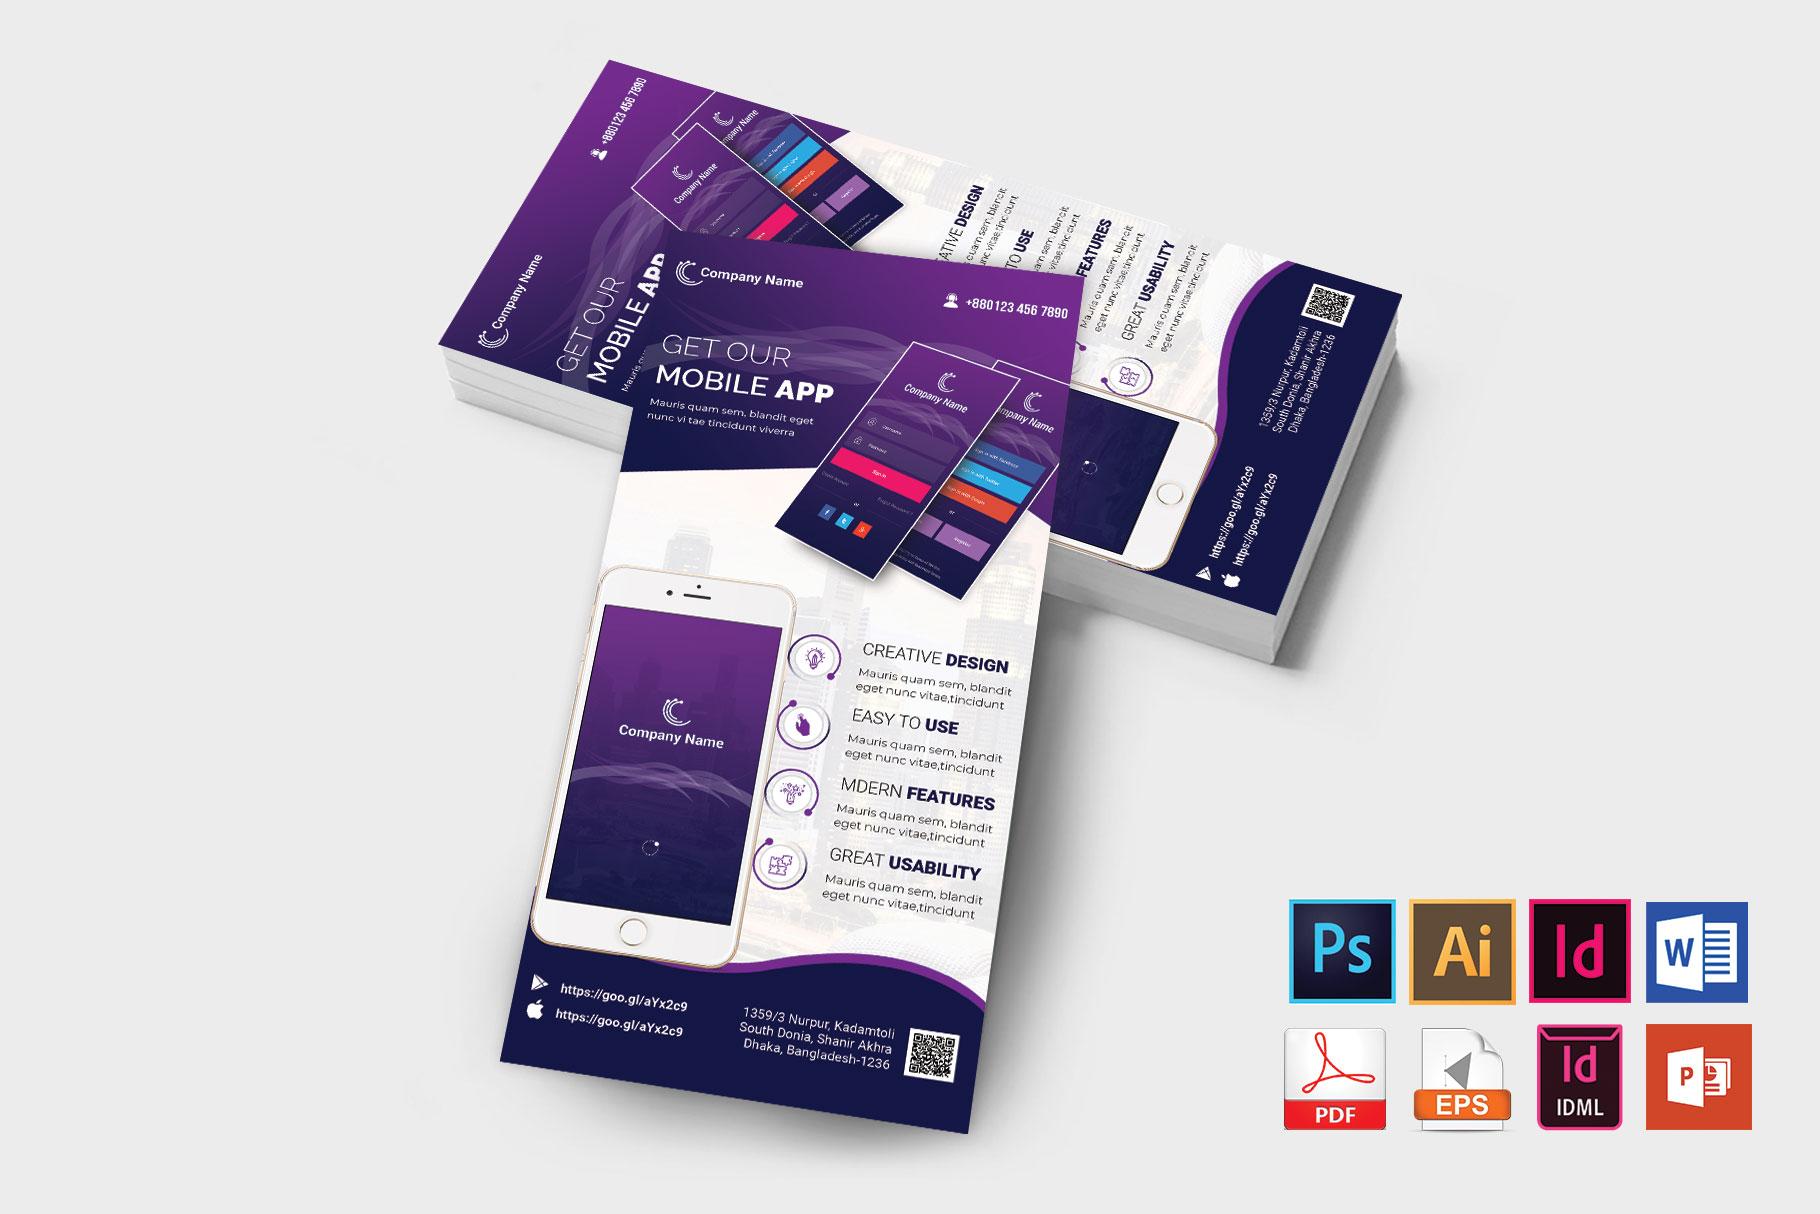 Mobile App Promotion DL Flyer Vol-01 example image 2